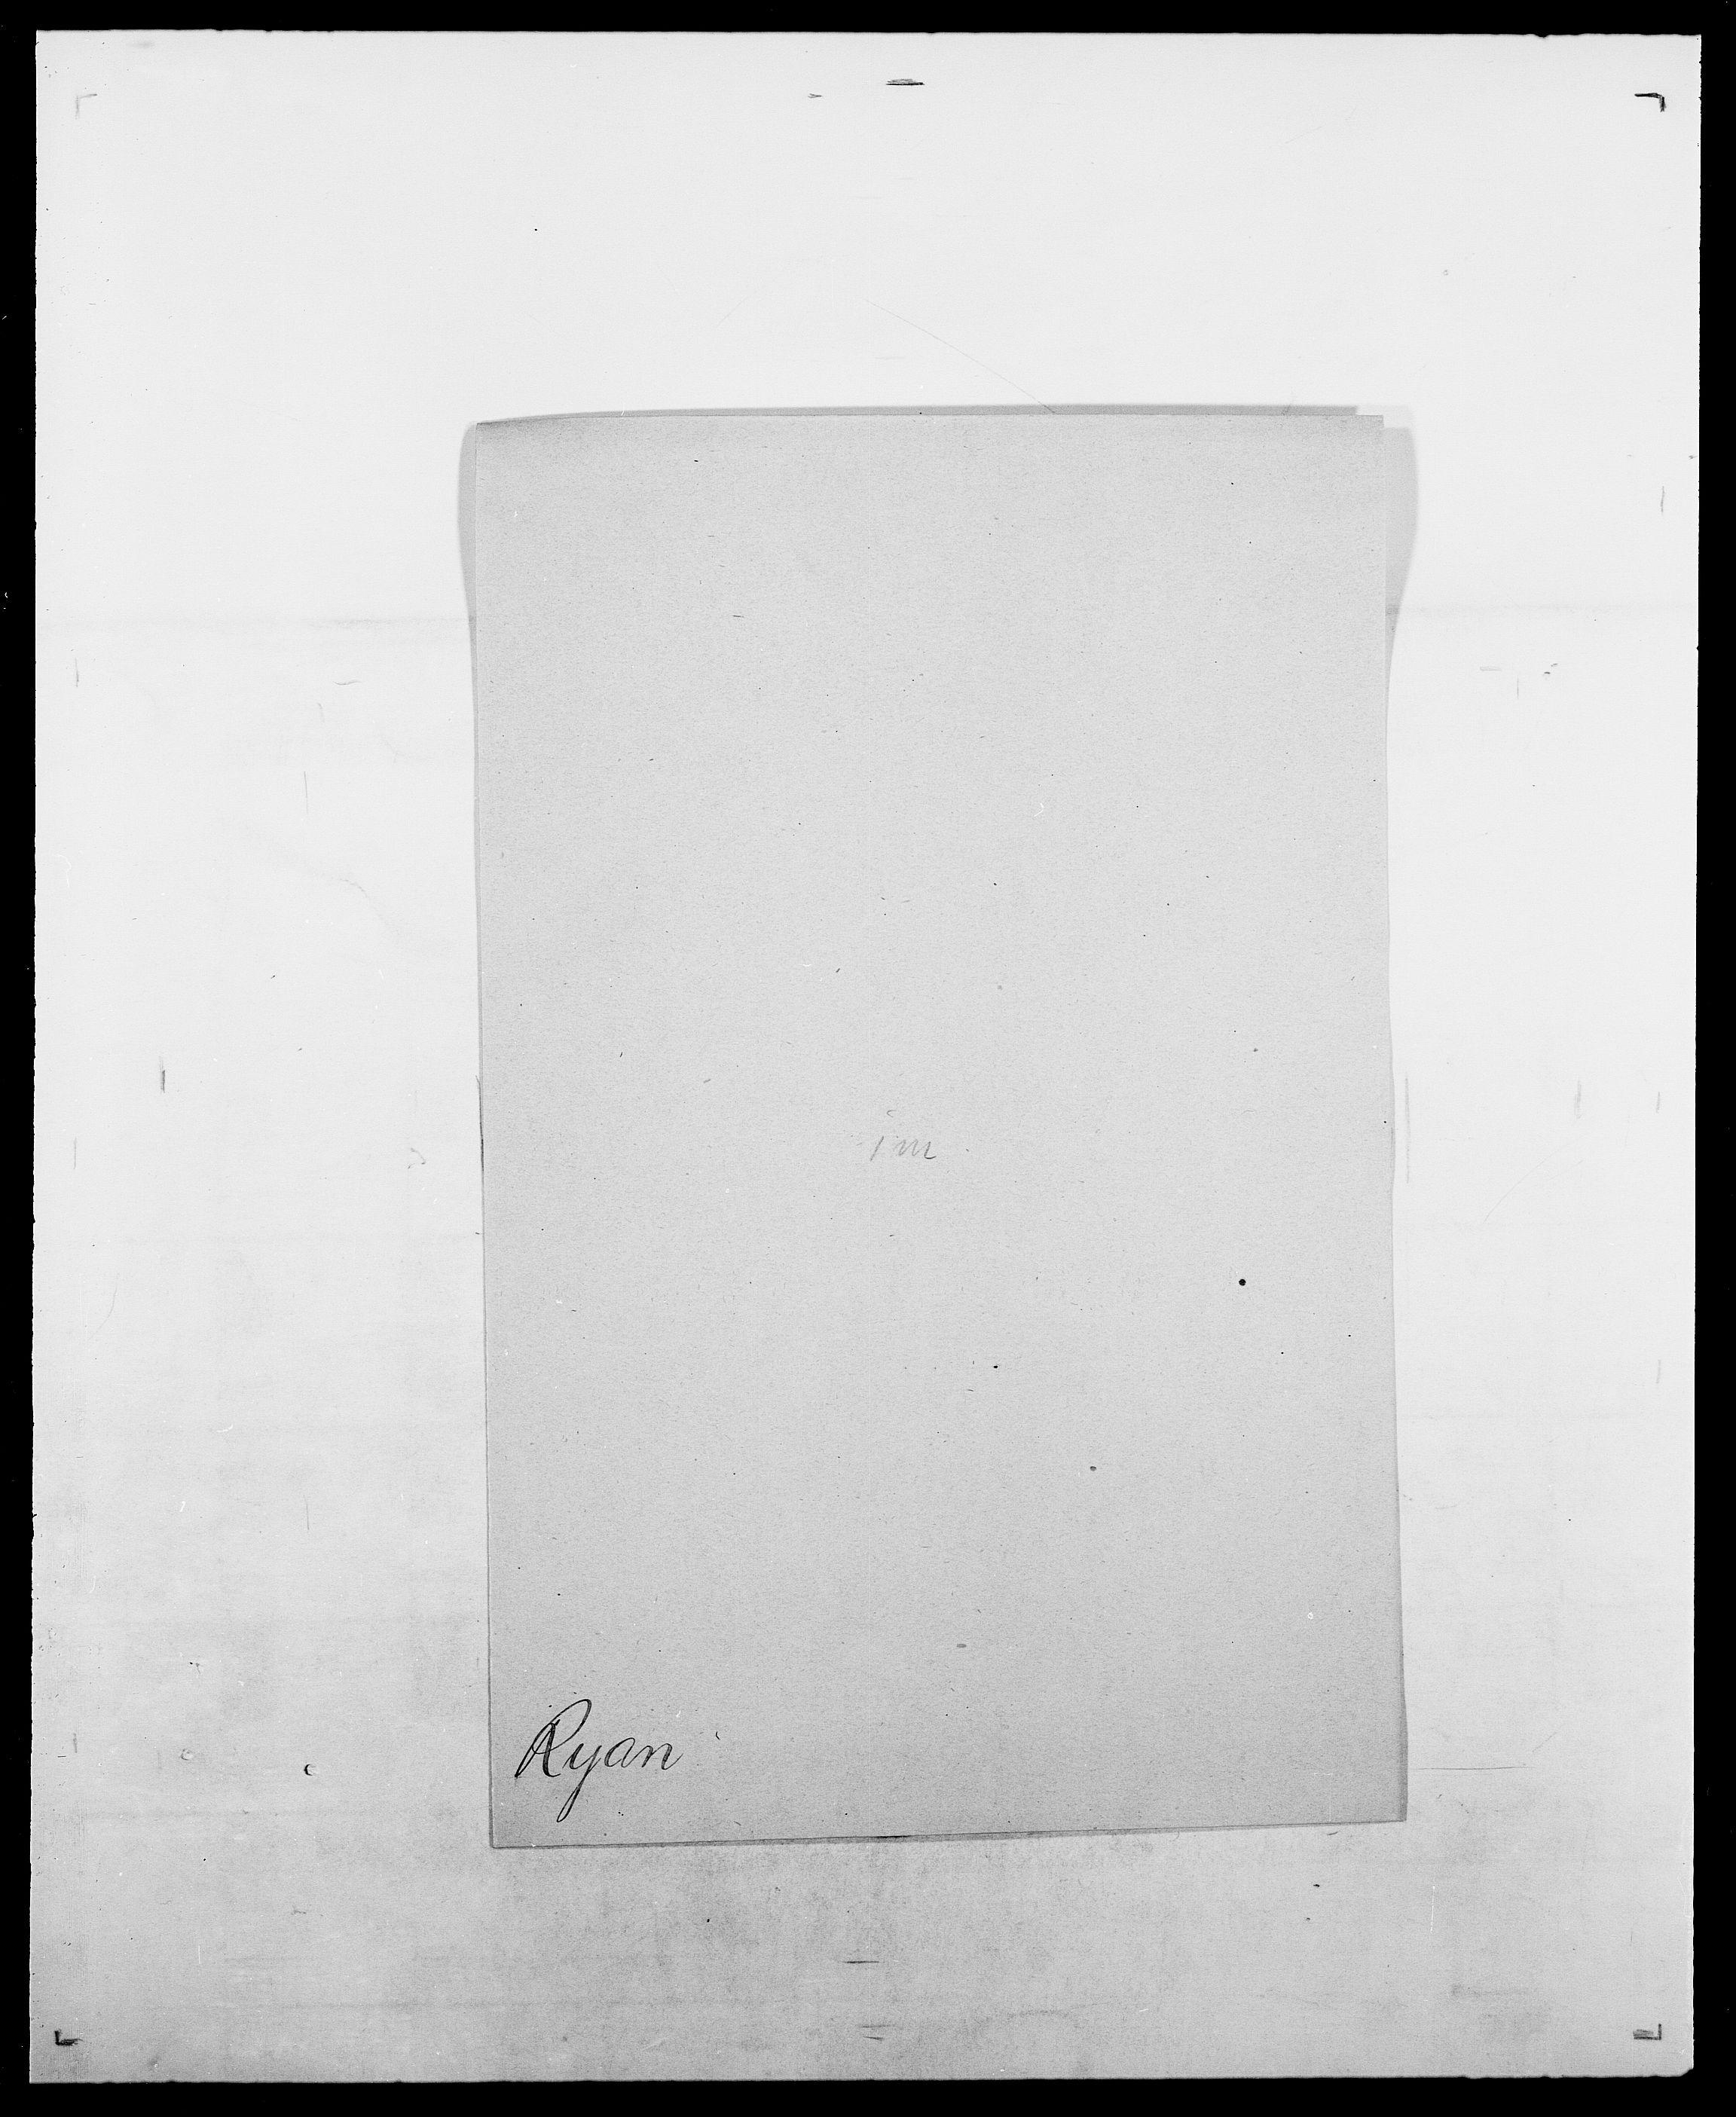 SAO, Delgobe, Charles Antoine - samling, D/Da/L0033: Roald - Røyem, s. 515